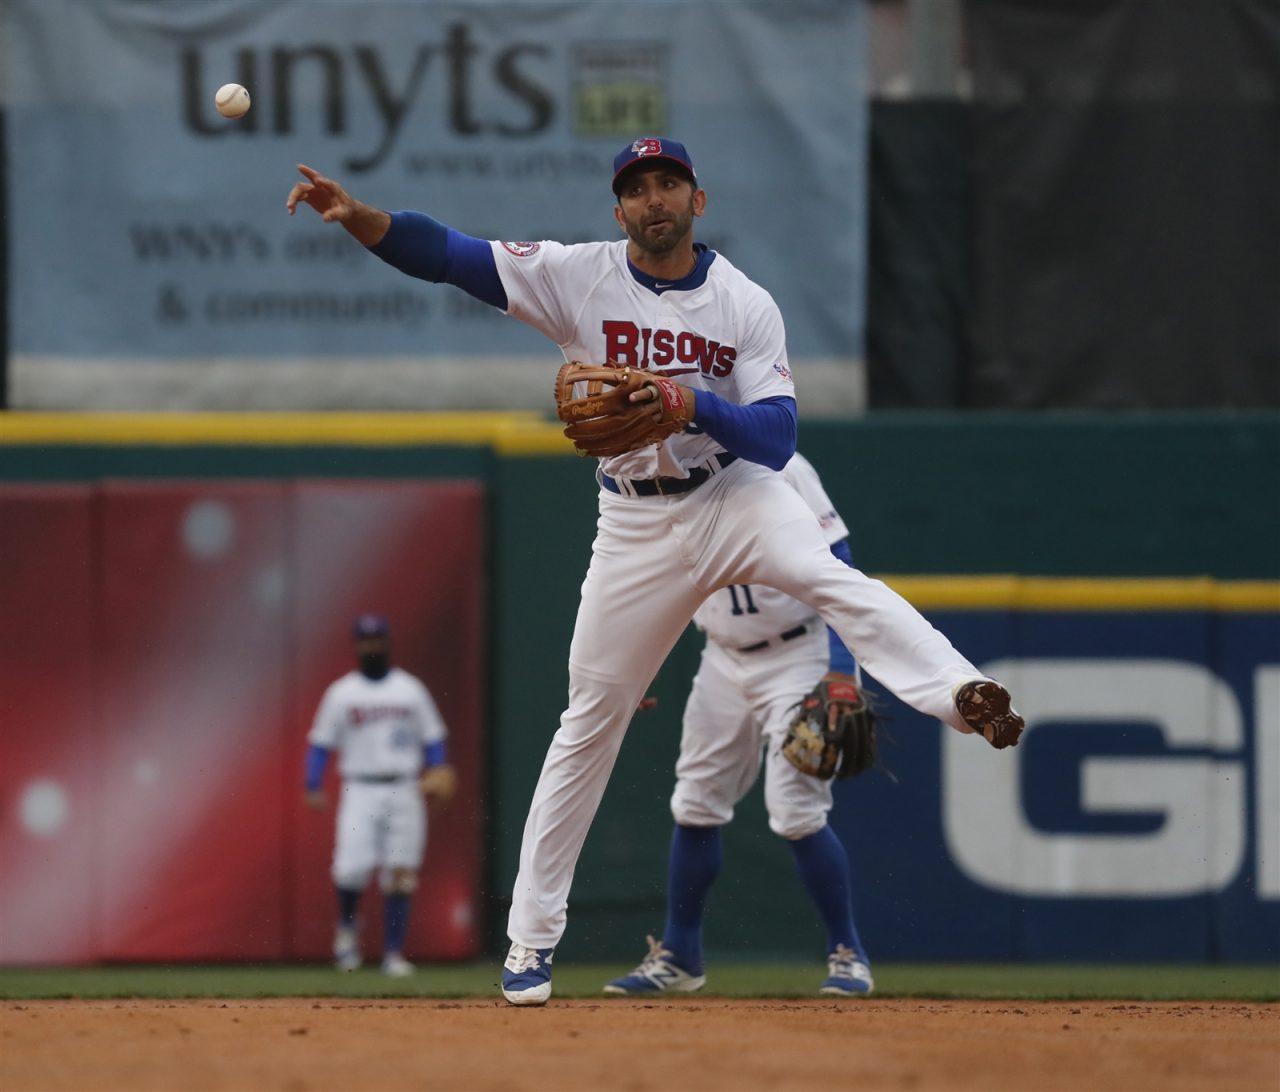 Jason Leblebijian said the new extra-inning rule has been interesting this season. (Harry Scull Jr./Buffalo News File Photo)